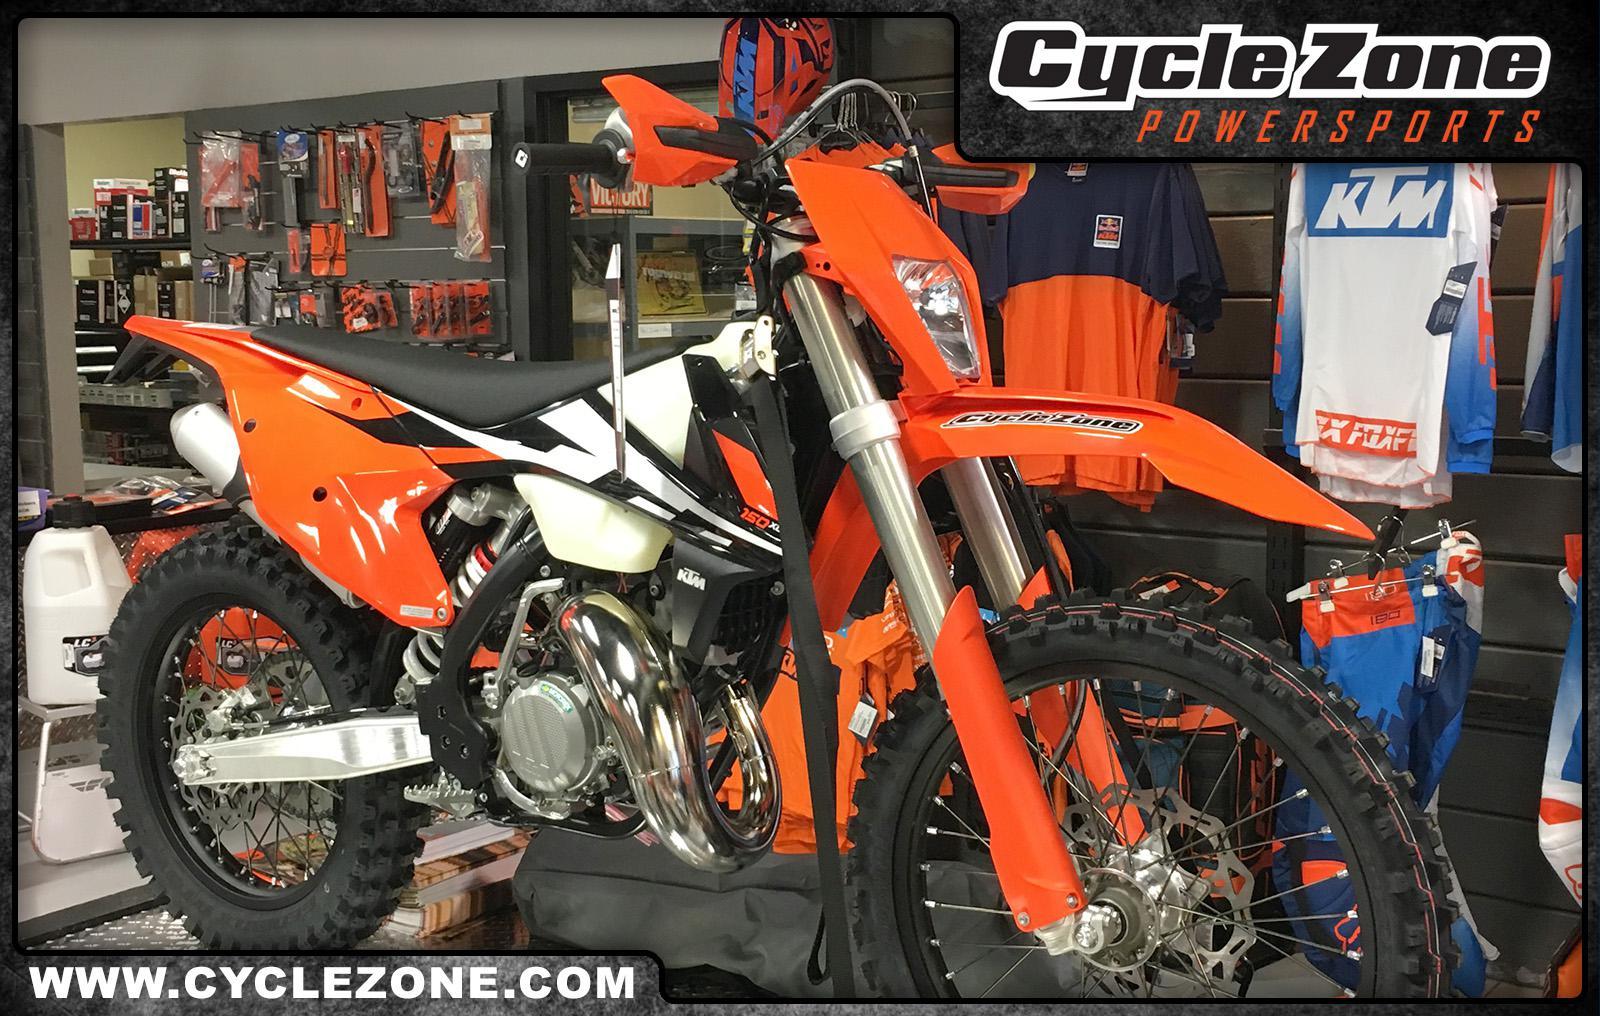 2017 ktm 150 xc-w for sale in topeka, ks | cycle zone powersports